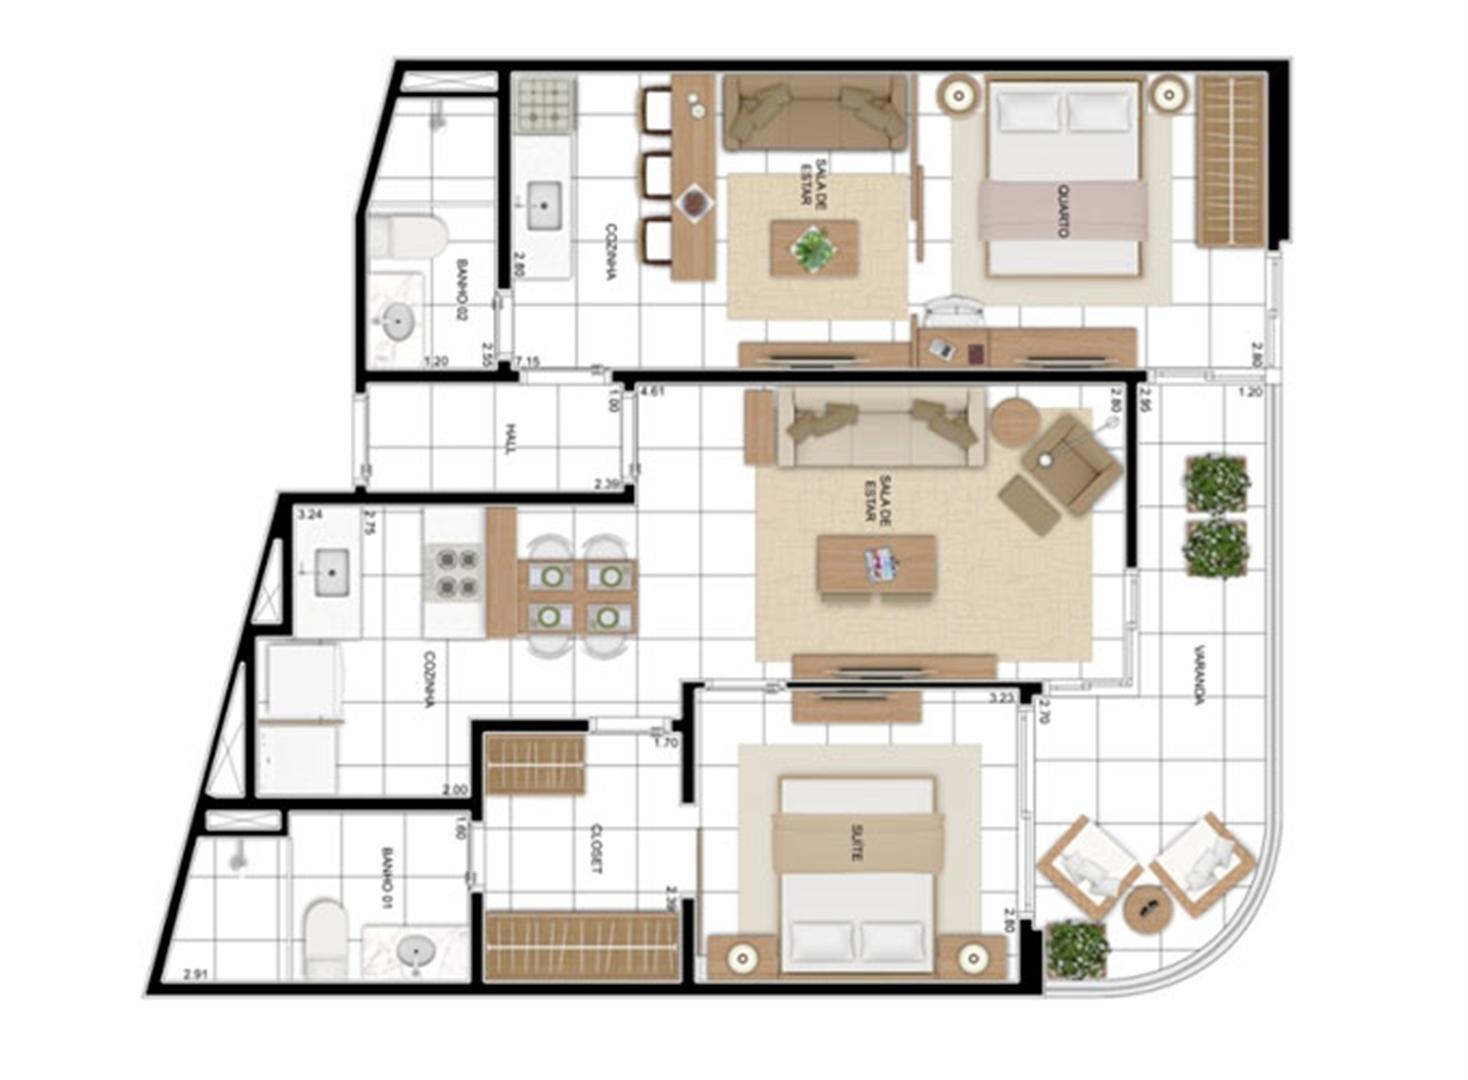 PLANTA - APTO TIPO A - 82 m² - DOUBLE FLAT  | In Mare Bali – Apartamento no  Distrito Litoral de Cotovelo - Parnamirim - Rio Grande do Norte